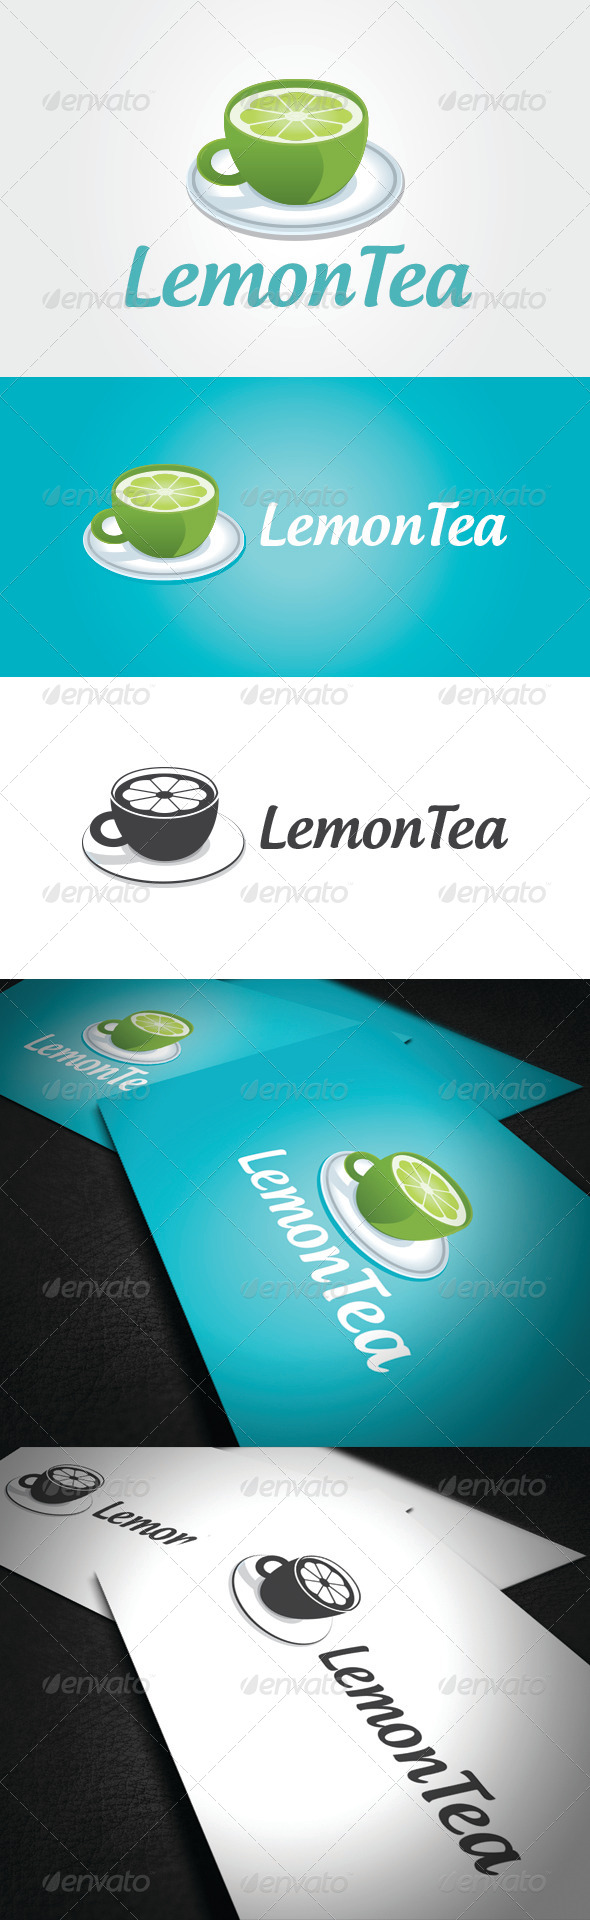 GraphicRiver Lemon Tea Logo Template 6610570